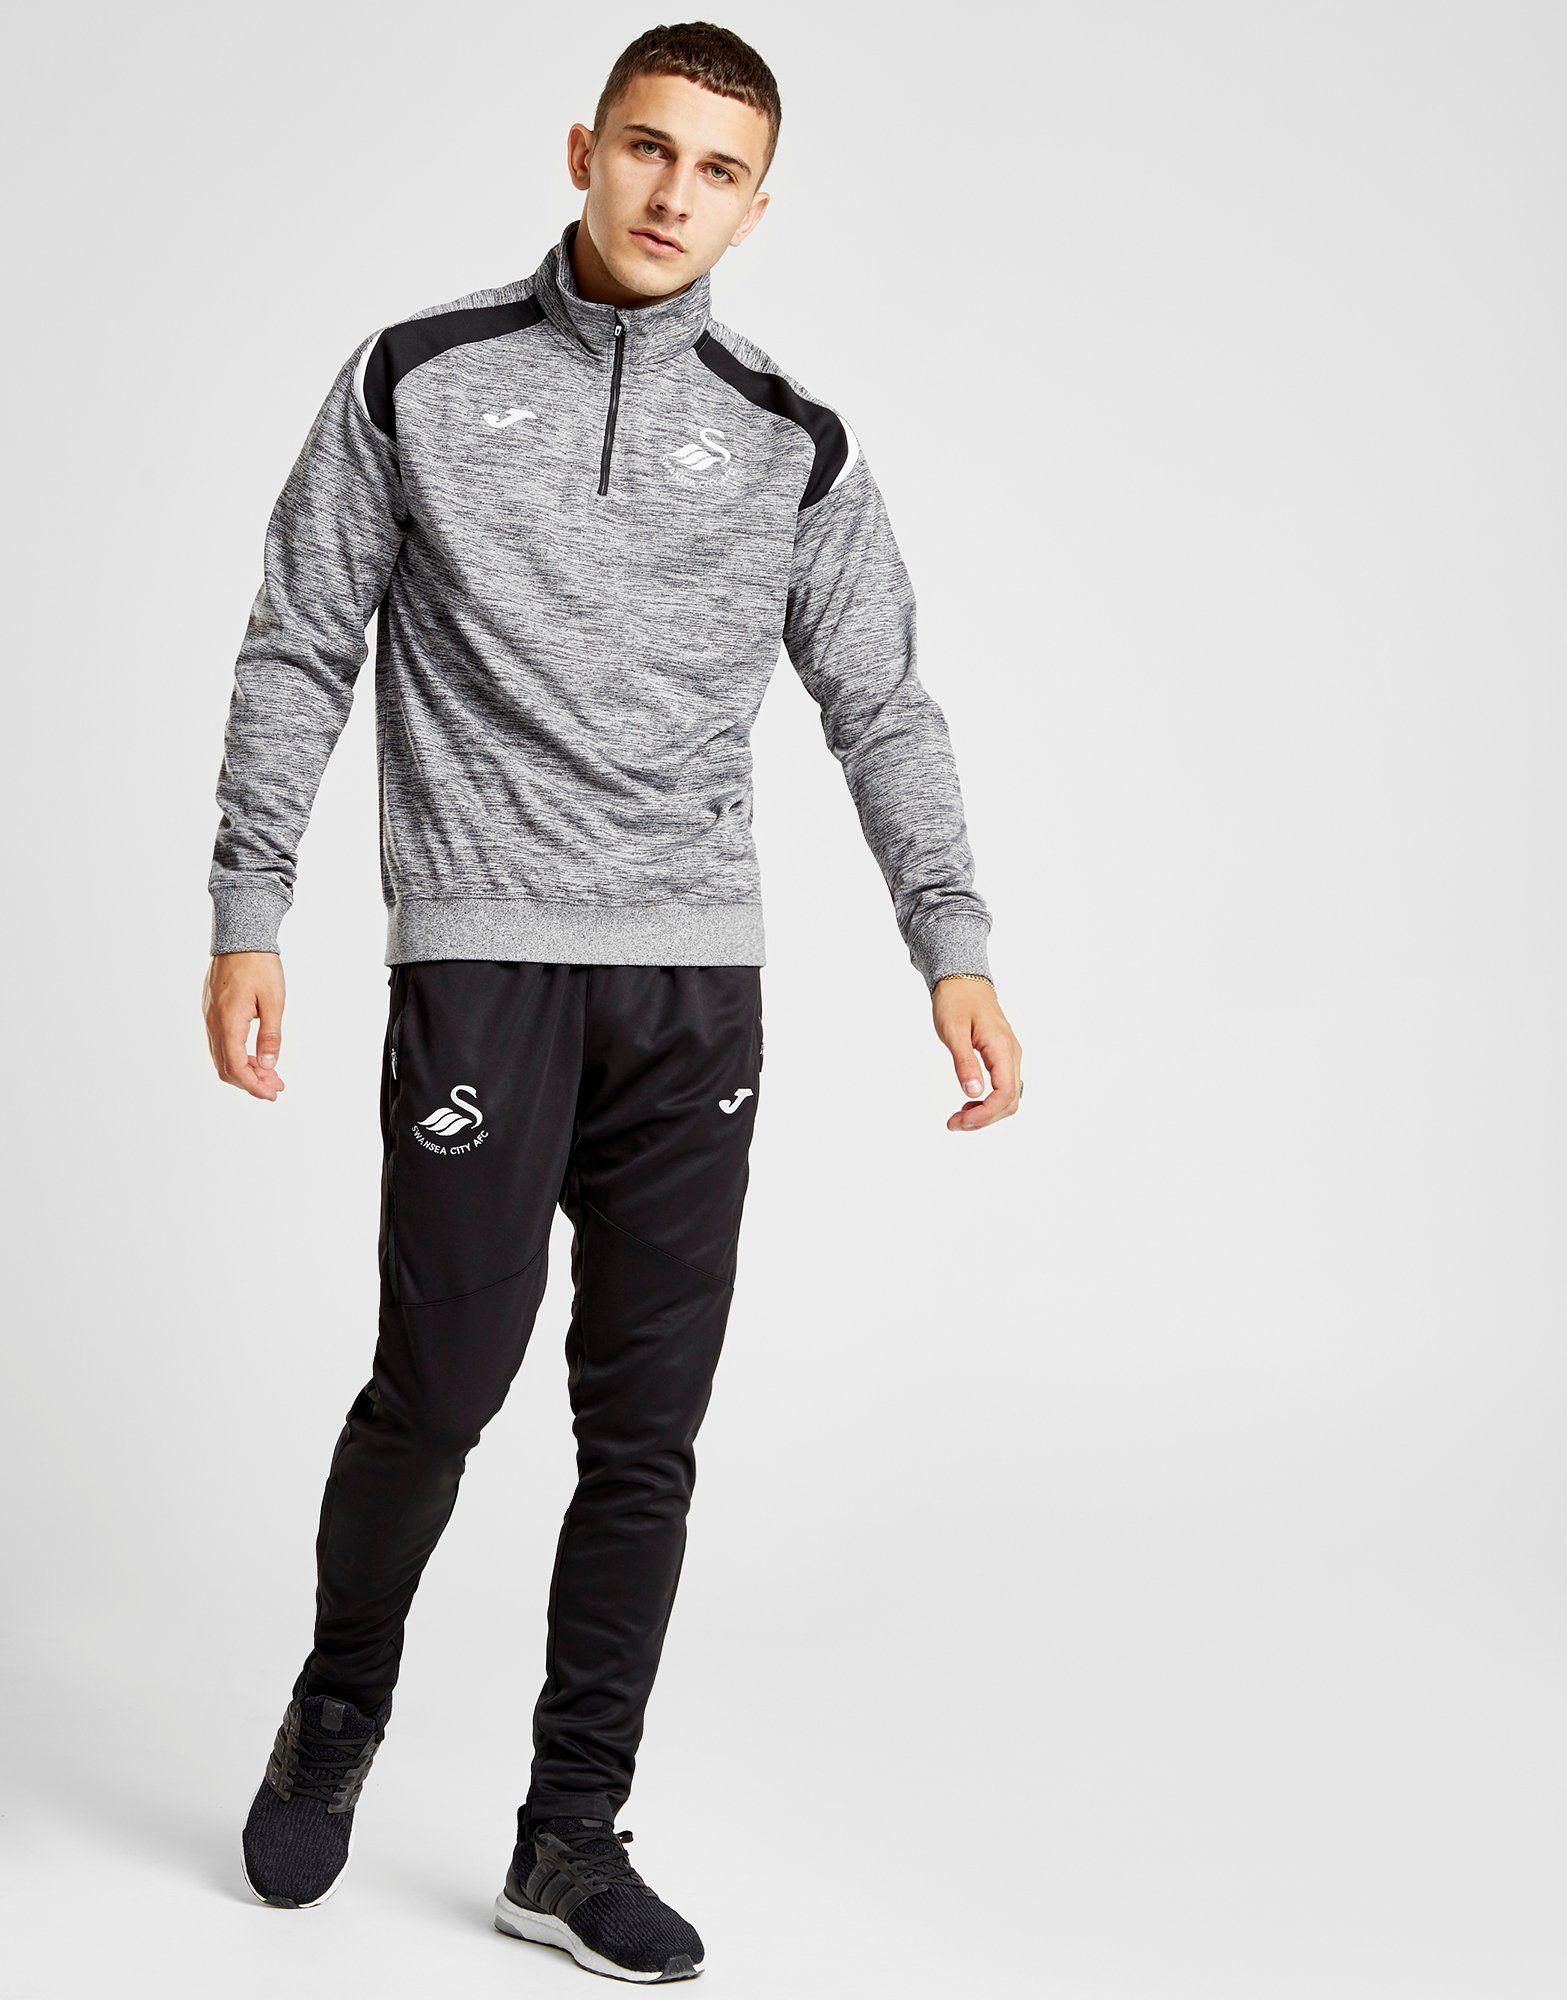 Joma Swansea City FC 2018/19 Training Top